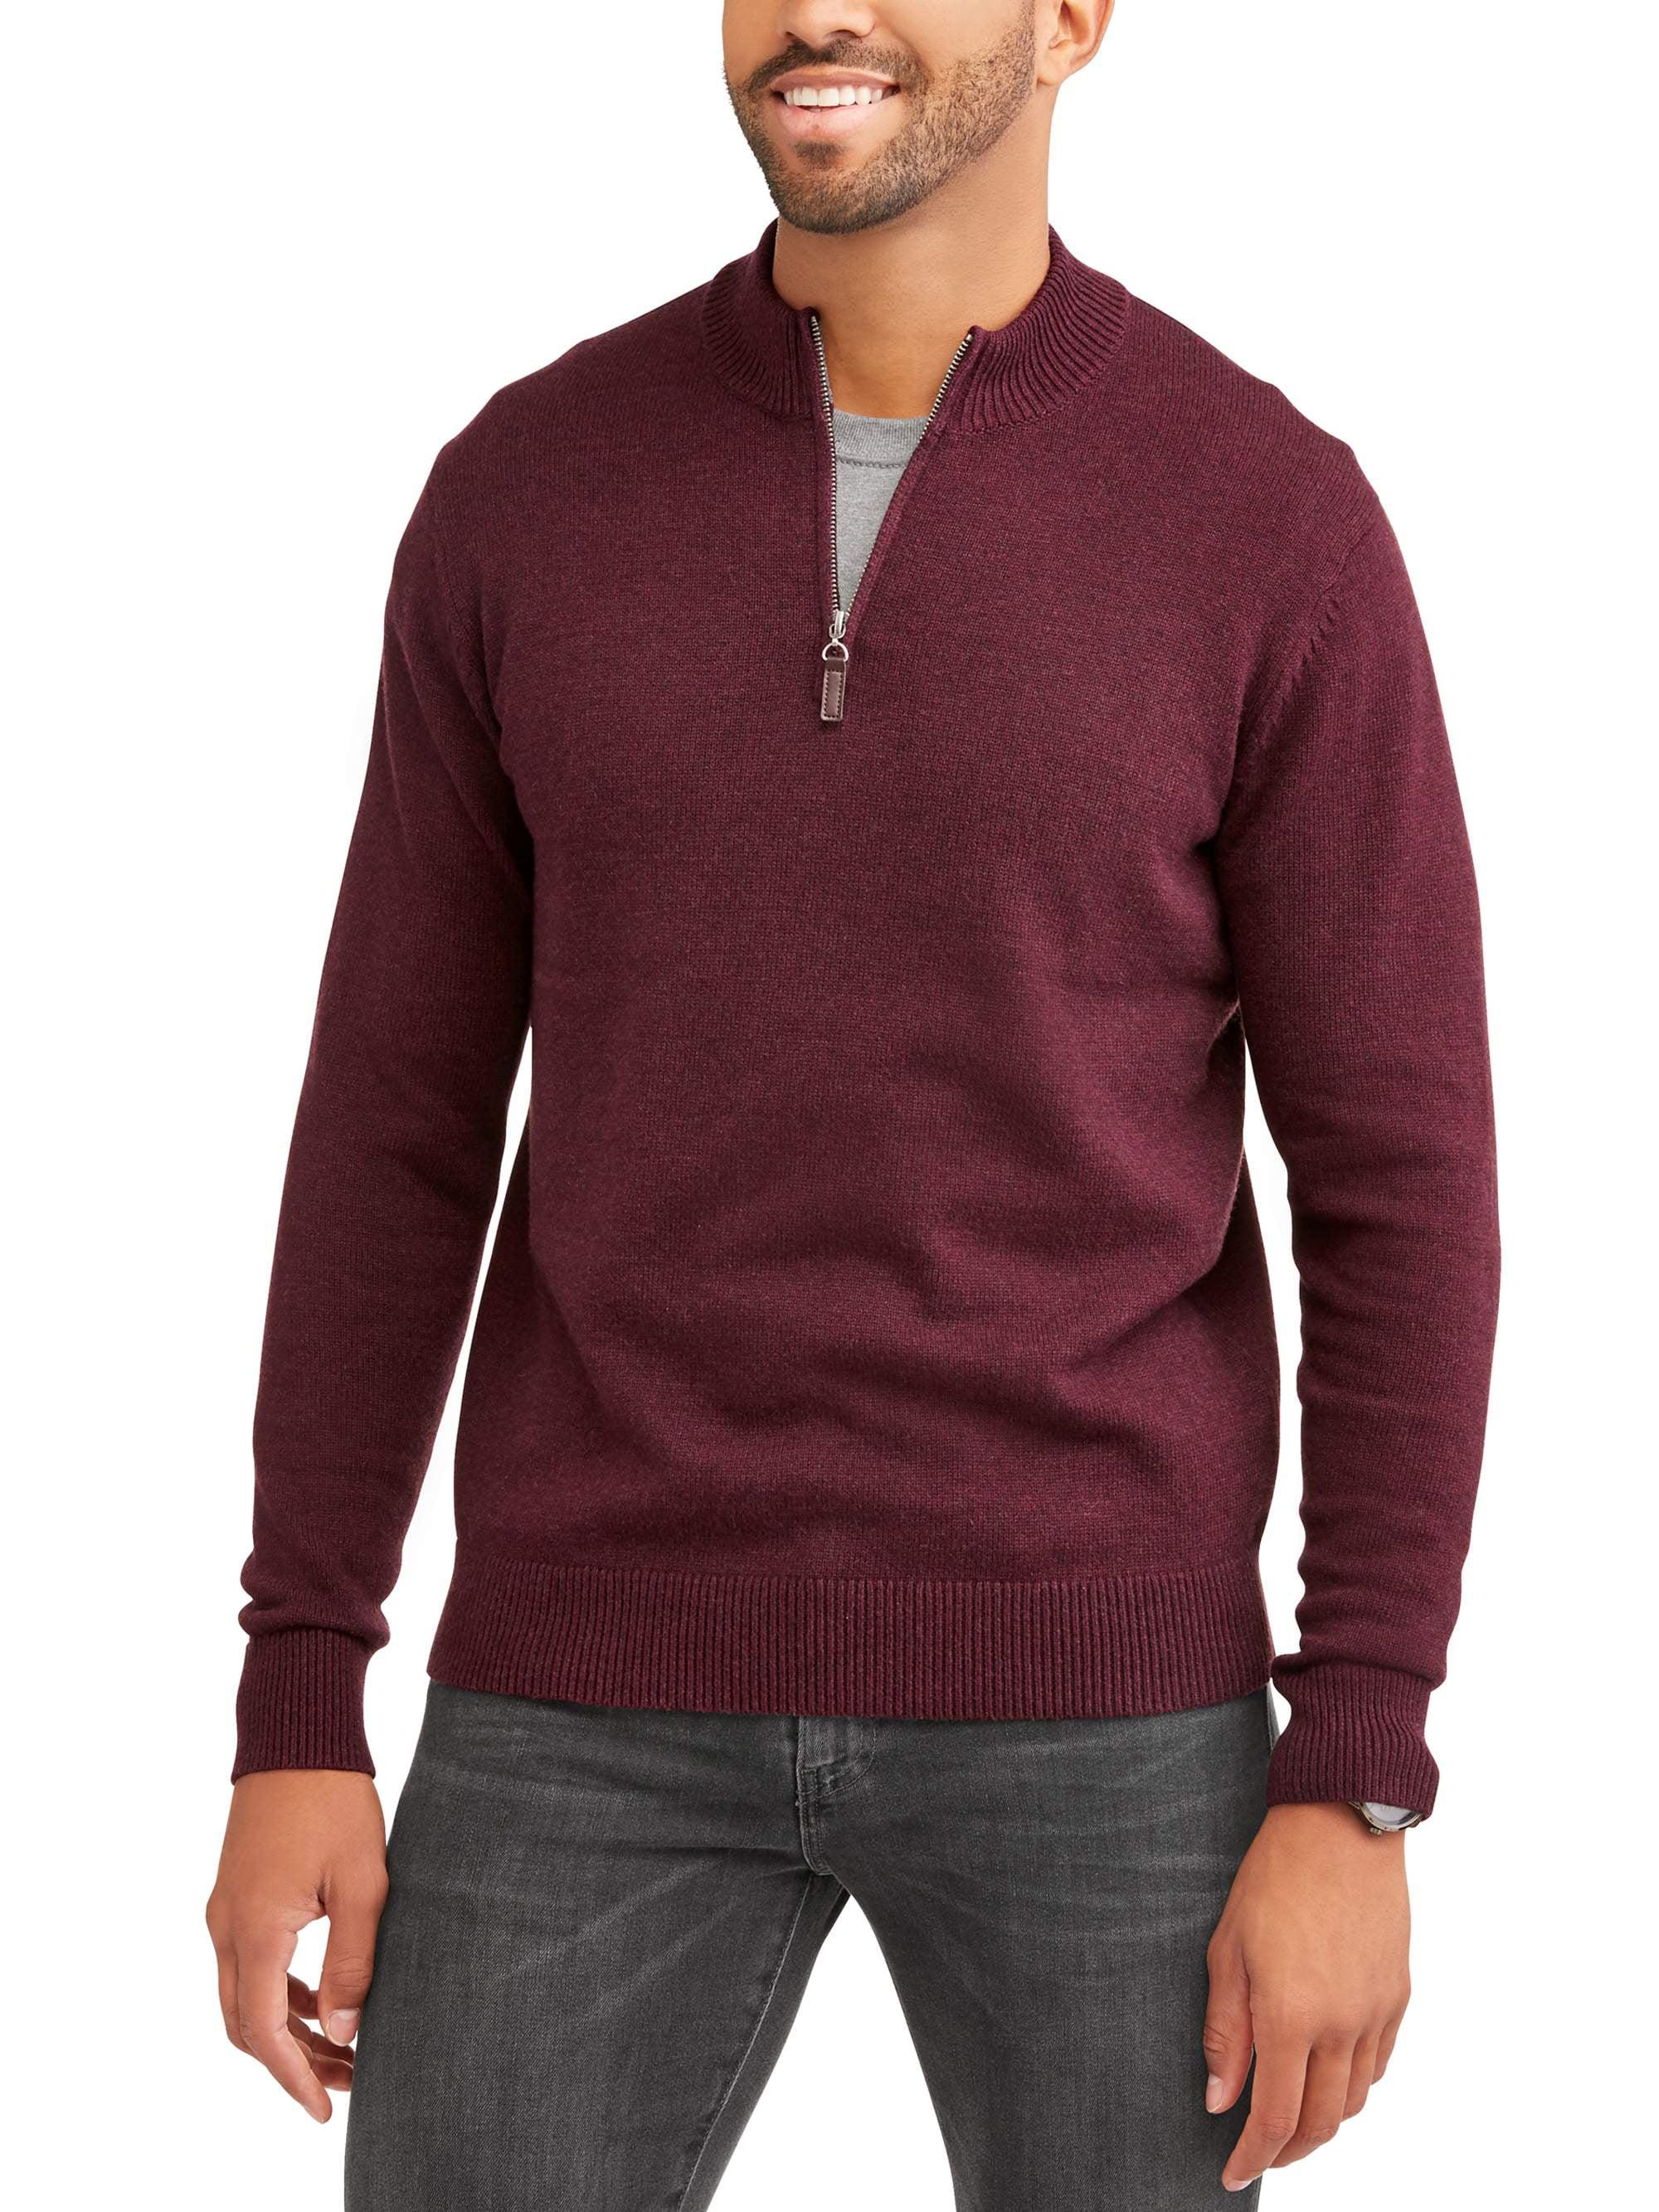 Men's Quarter Zip Sweater, Up to Size 5XL